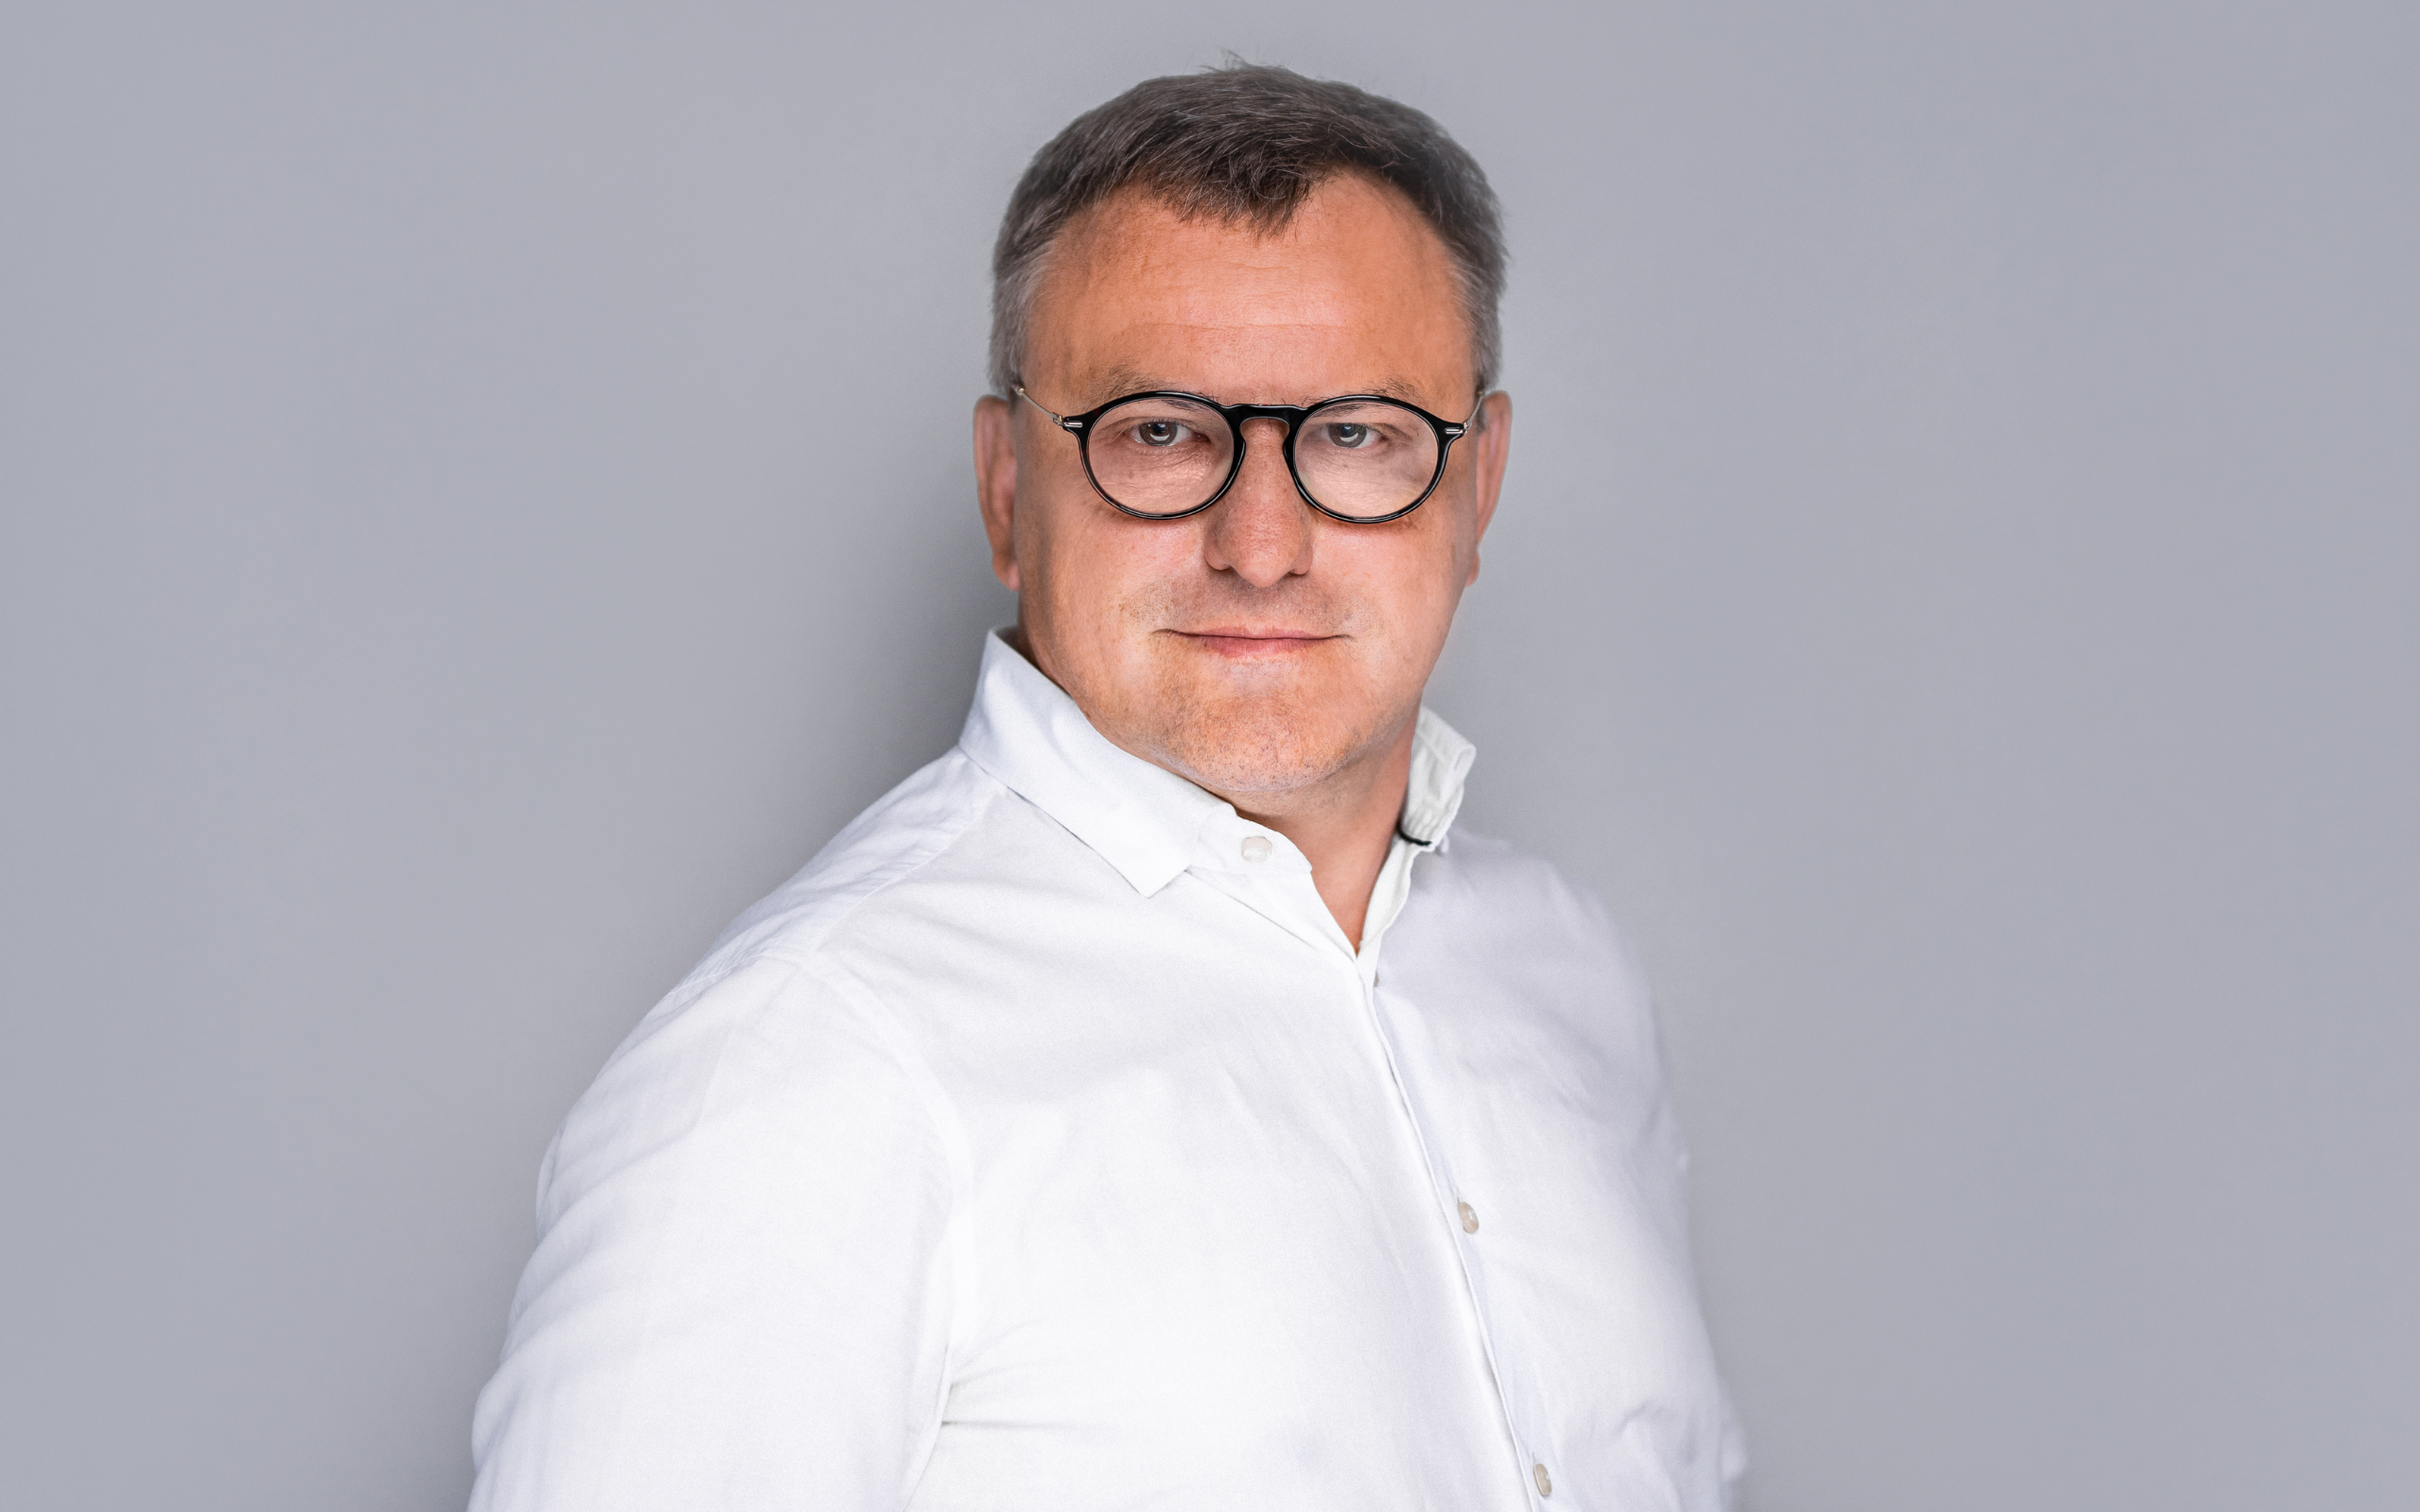 Andrzej Biziuk